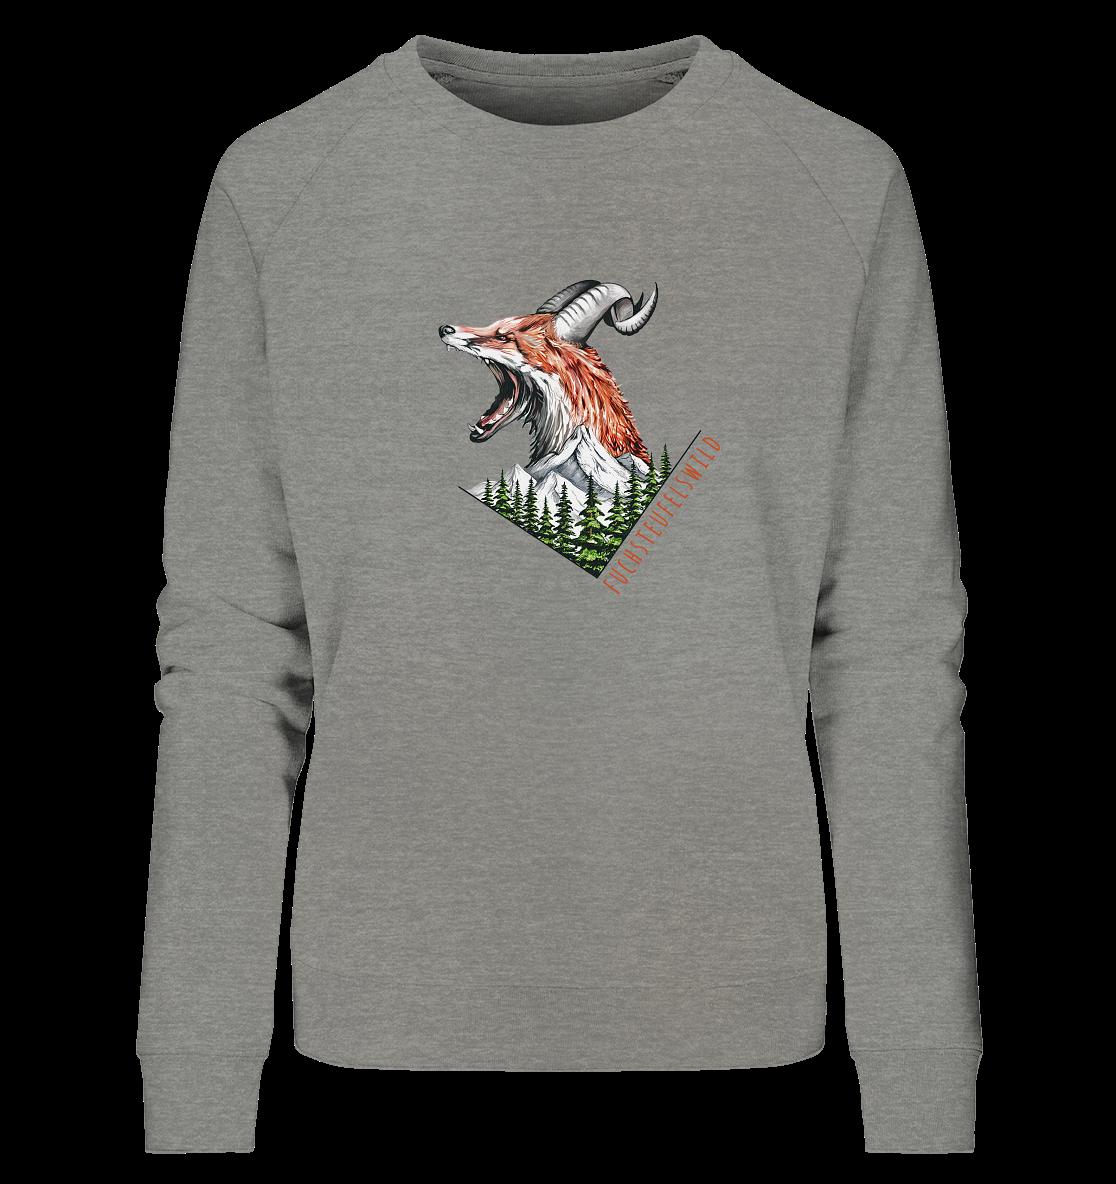 front-ladies-organic-sweatshirt-818381-1116x-1.png